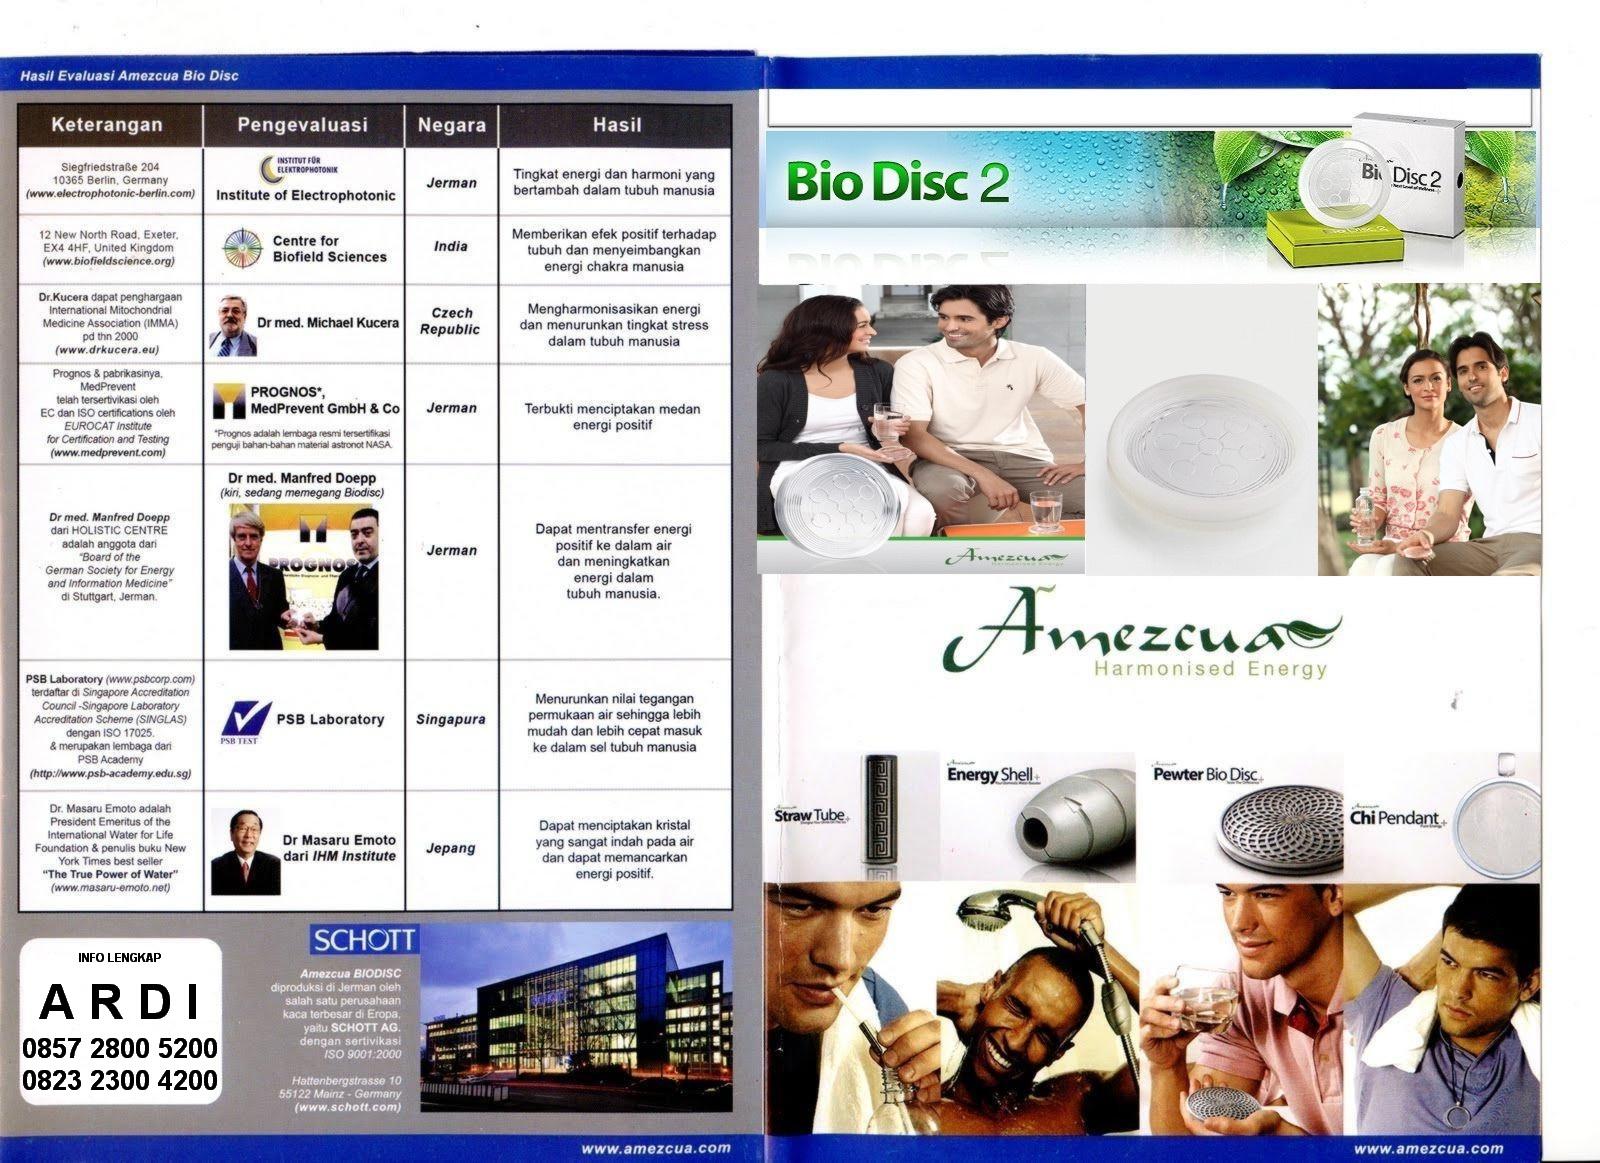 manfaat bio disc 2 luar biasa biodisc2 solo 0857 2800 5200. Black Bedroom Furniture Sets. Home Design Ideas